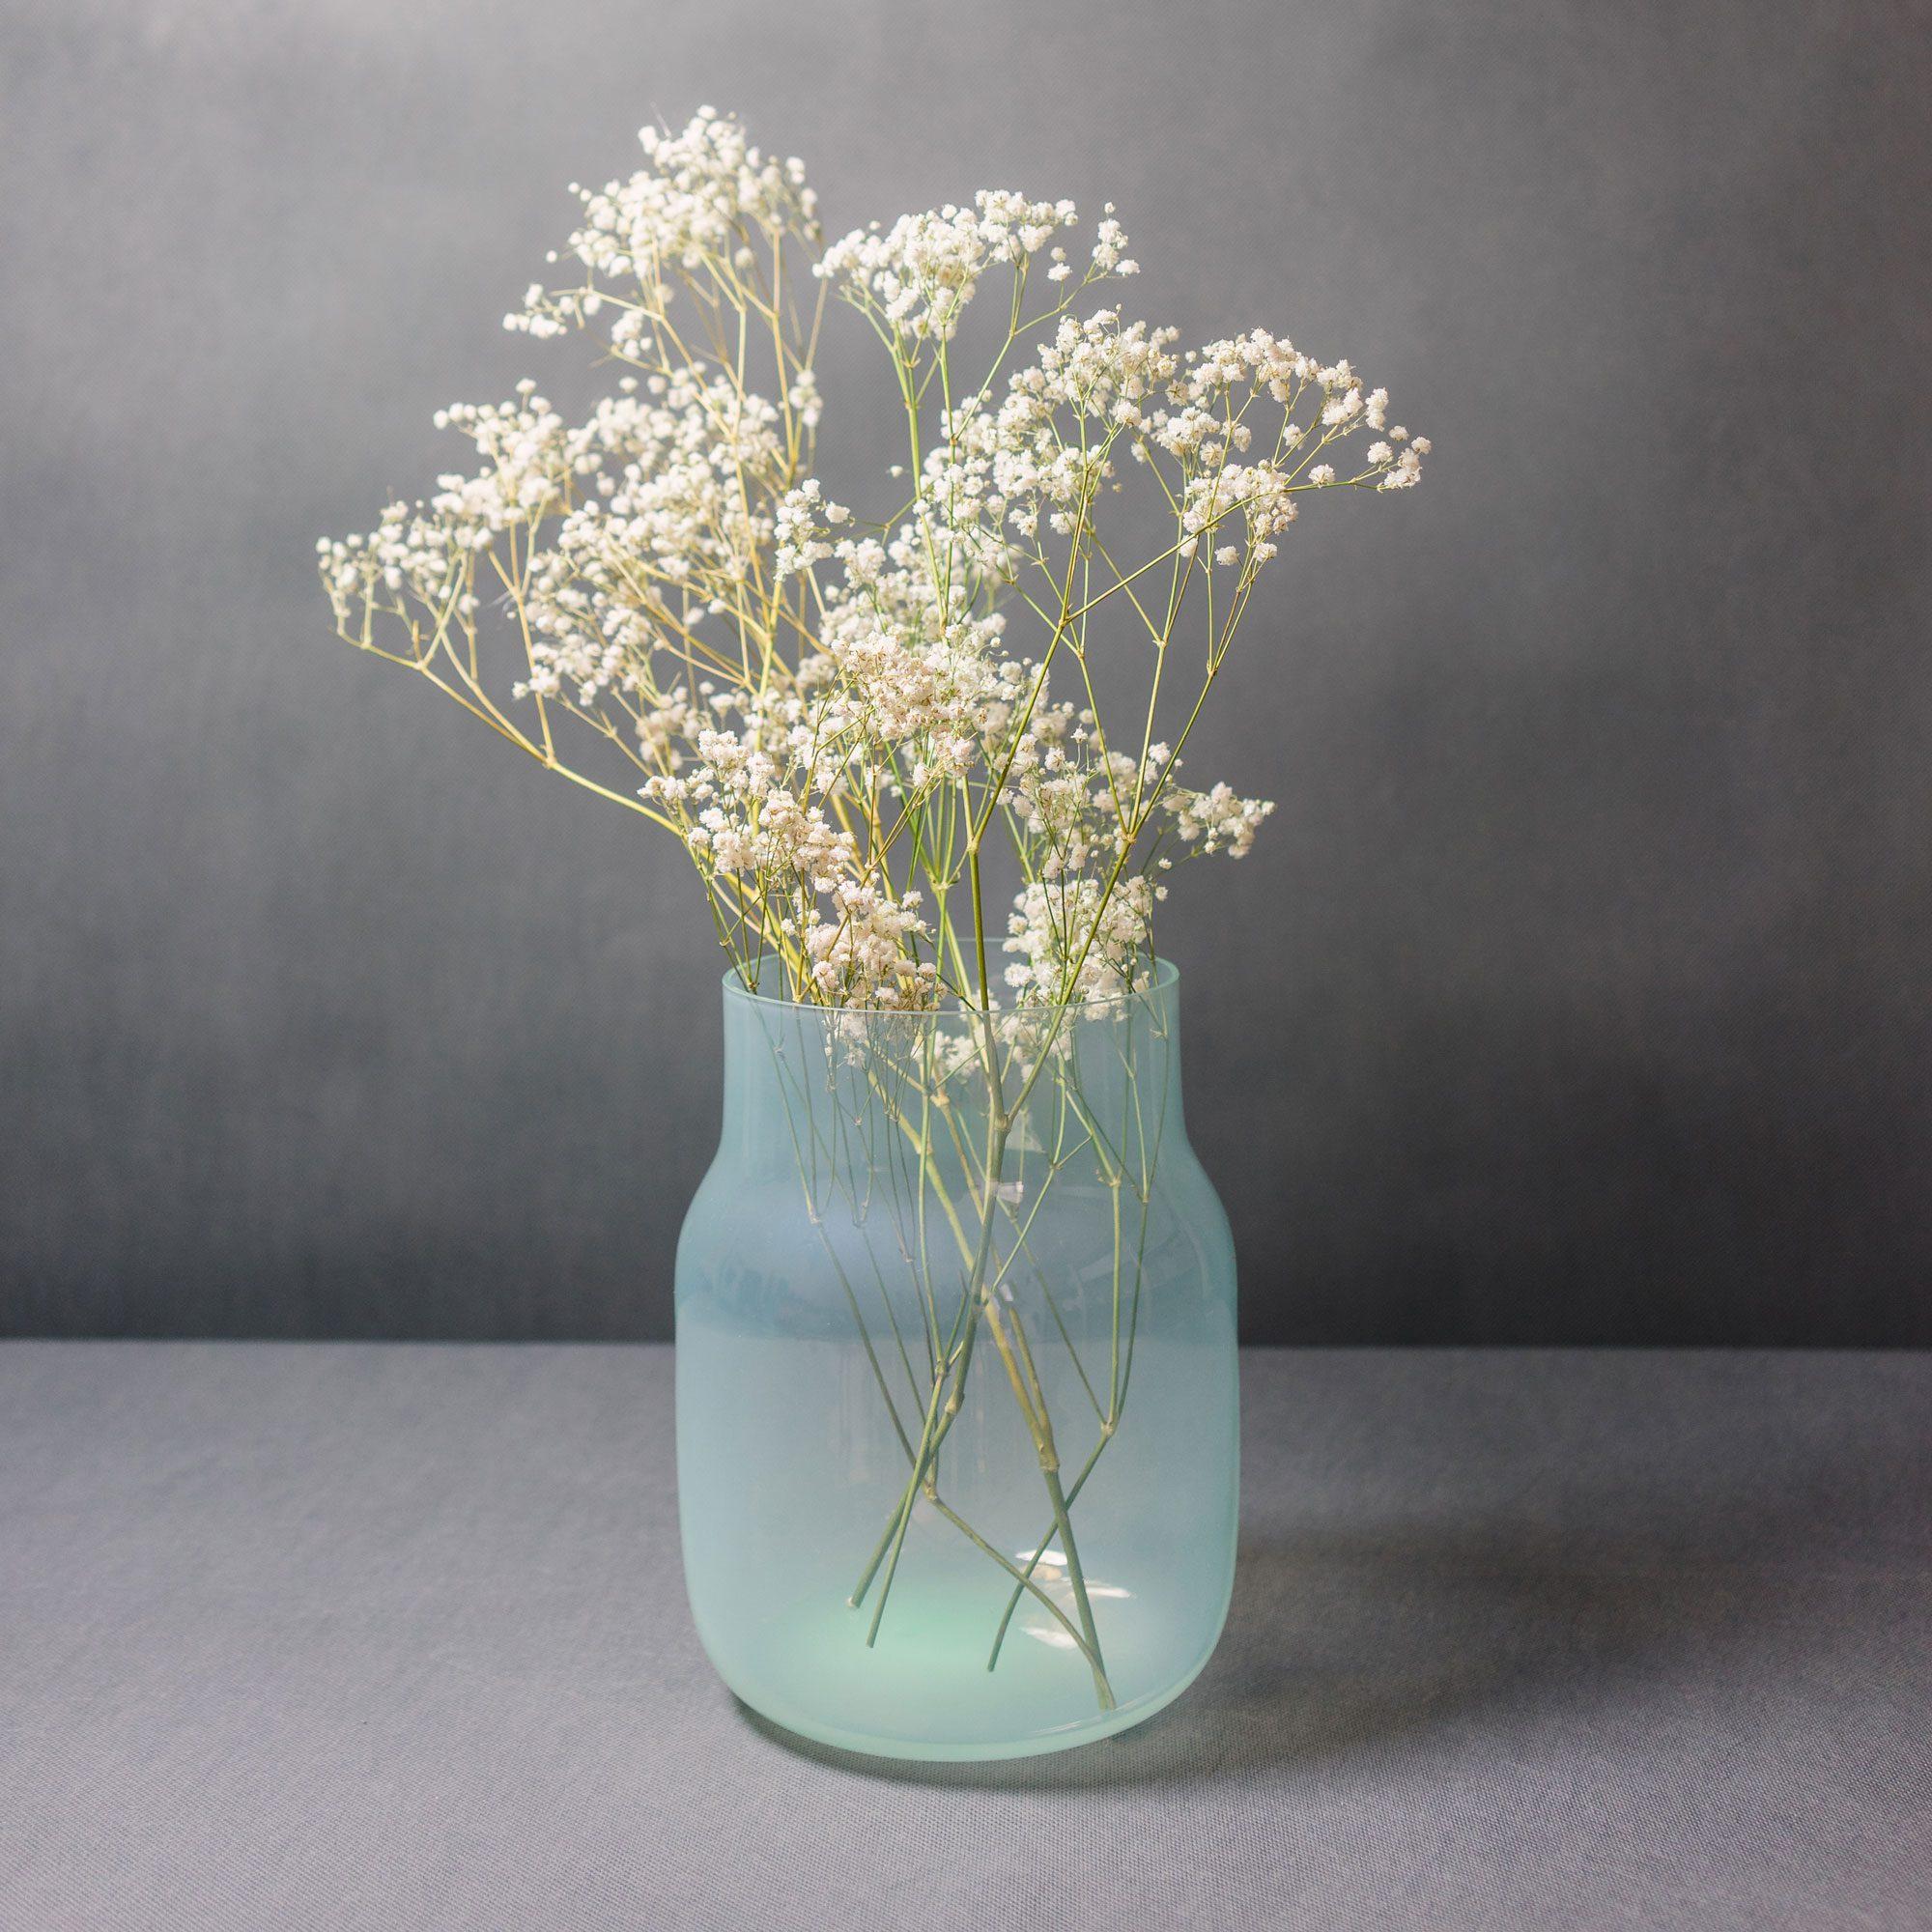 Bohemian glass vase by Dechem